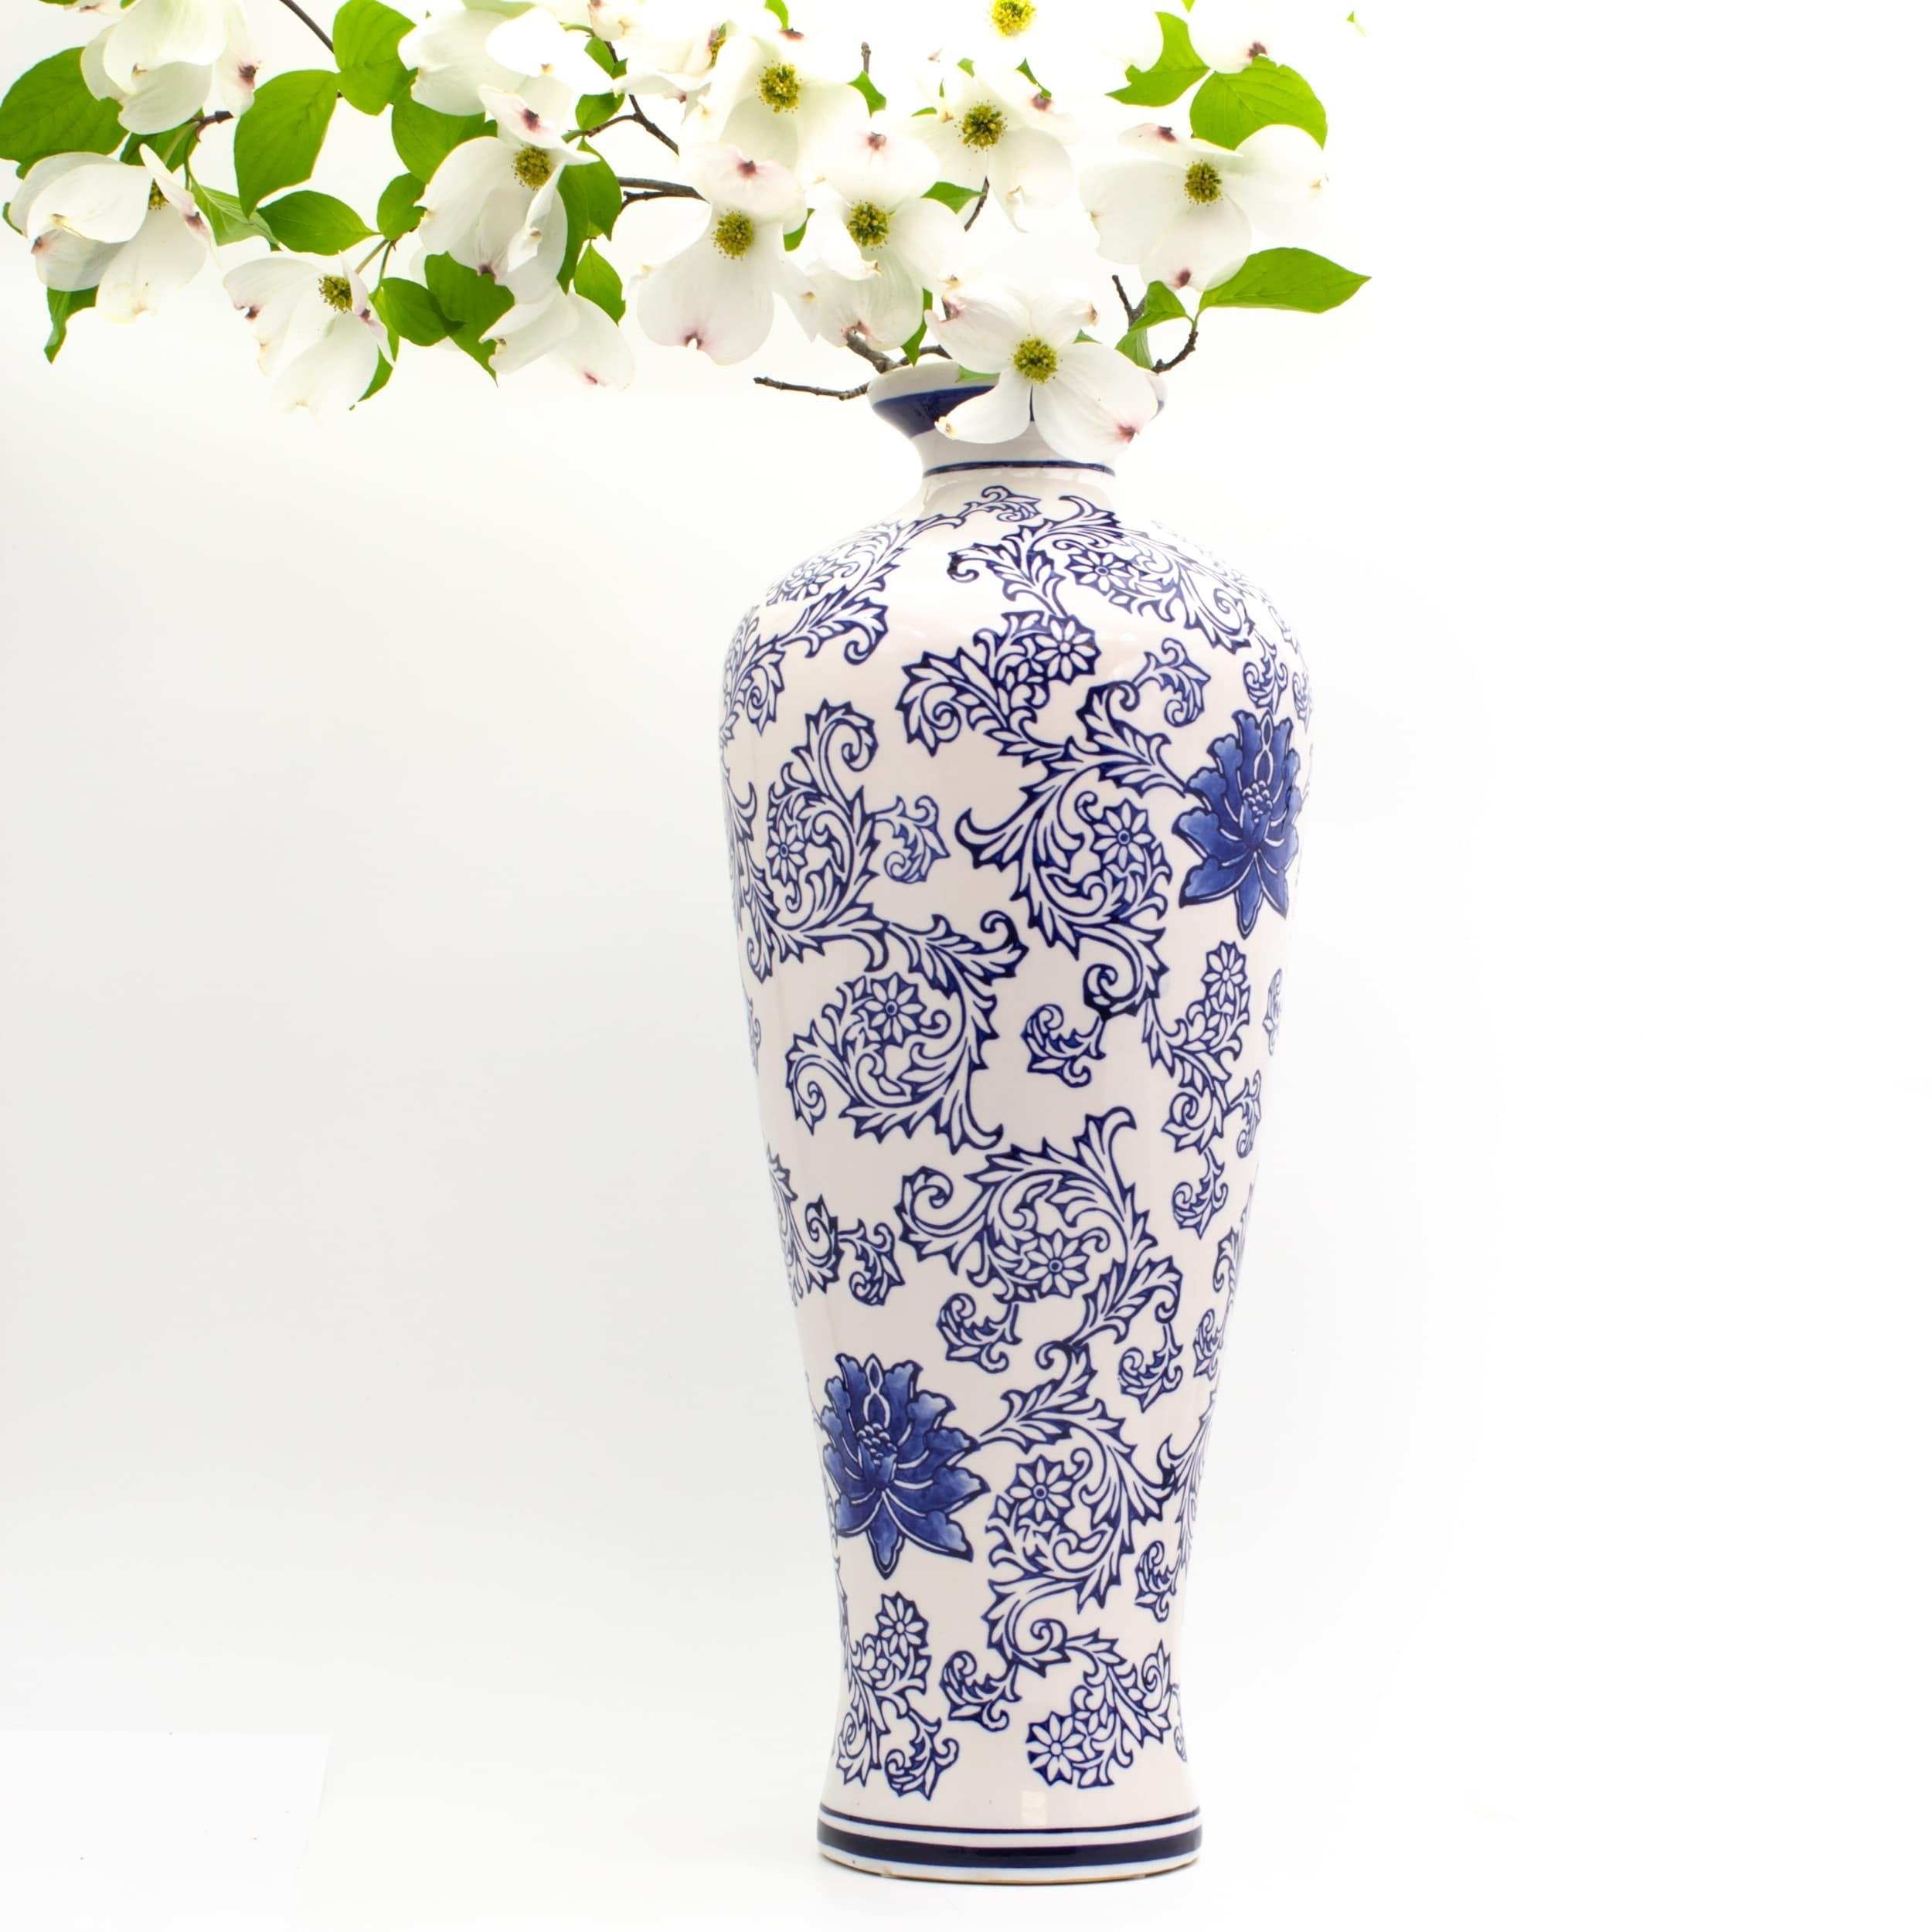 Shop Claybarn Blue Garden White Tall Vase Overstock 21030280